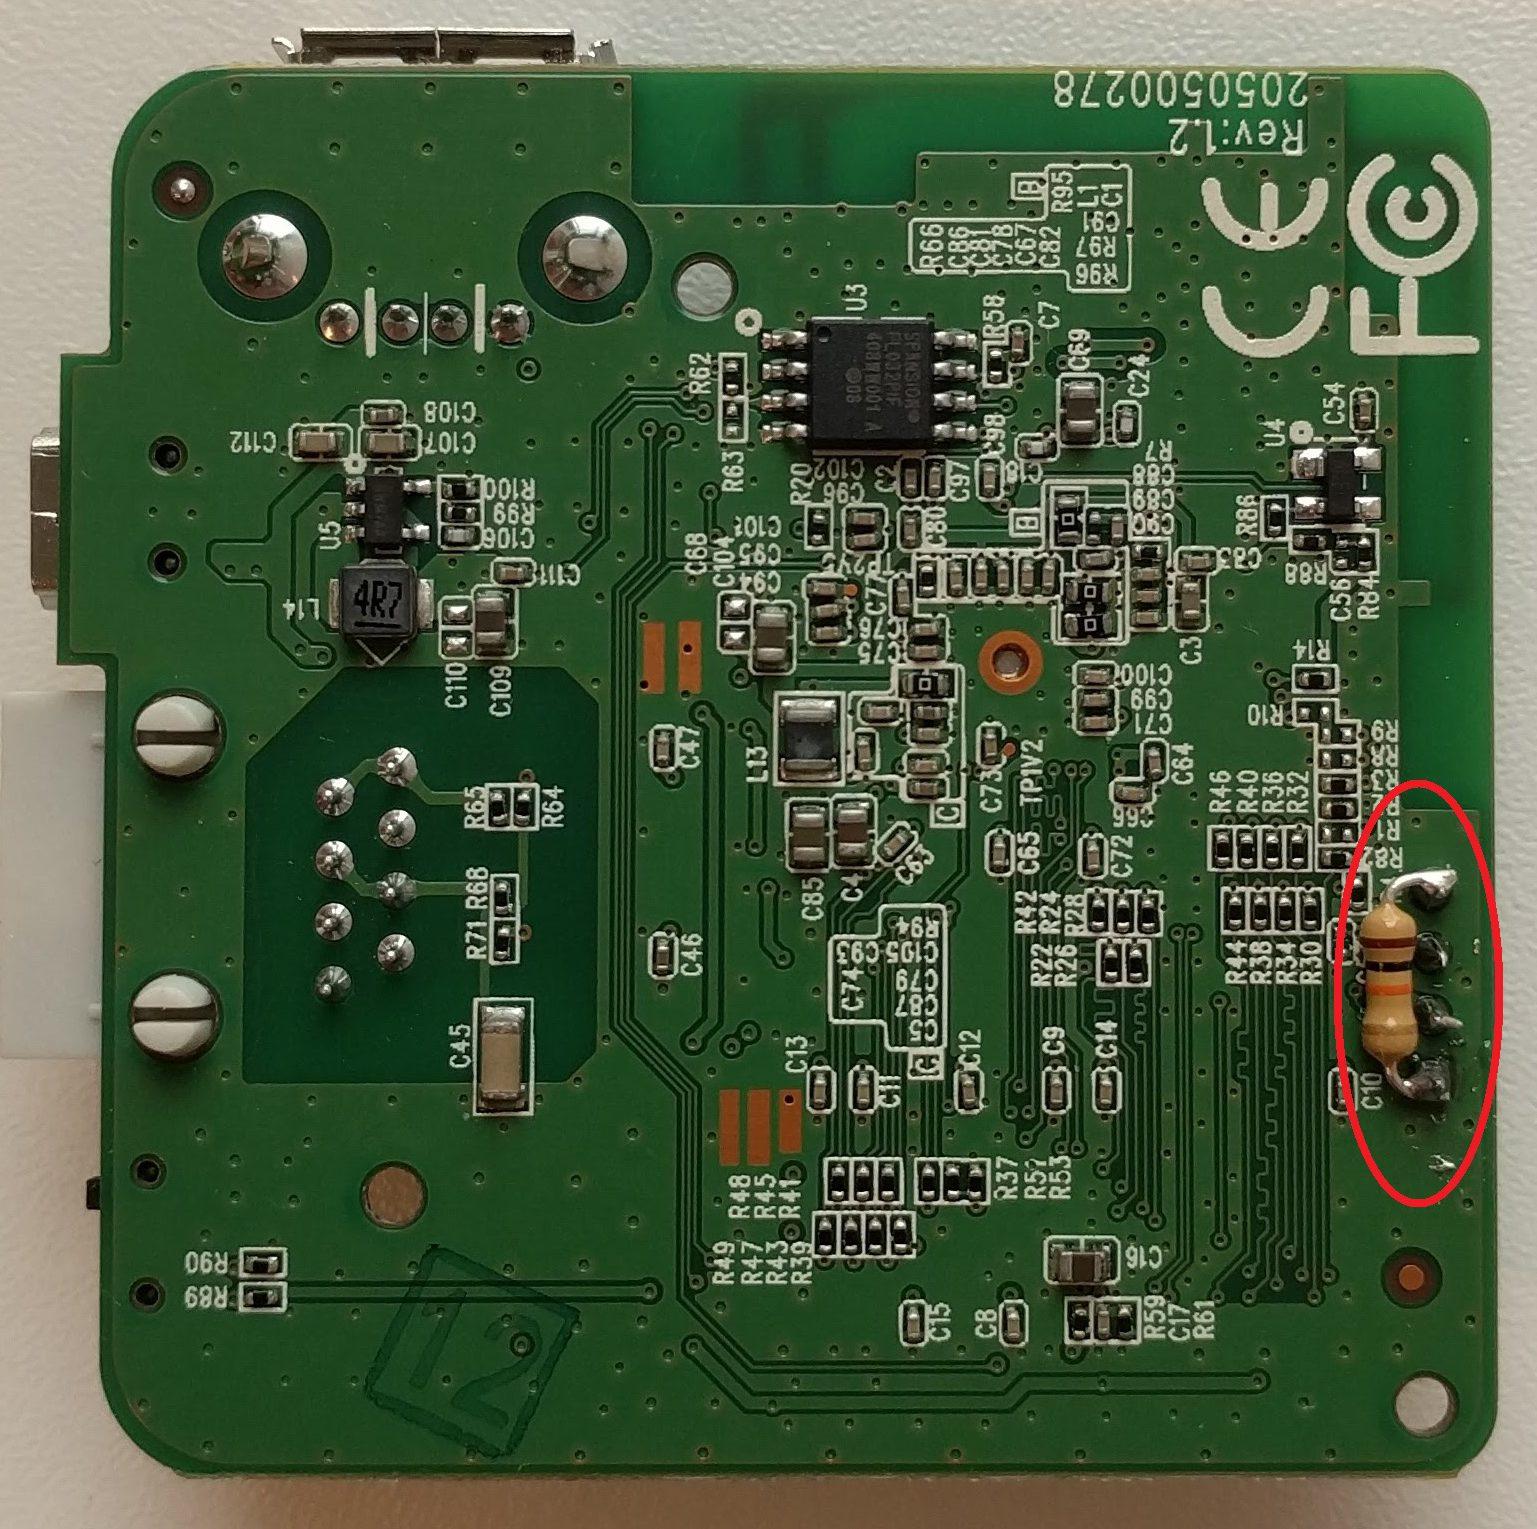 Flash bricked TP_Link LT-MR3020 wireless router